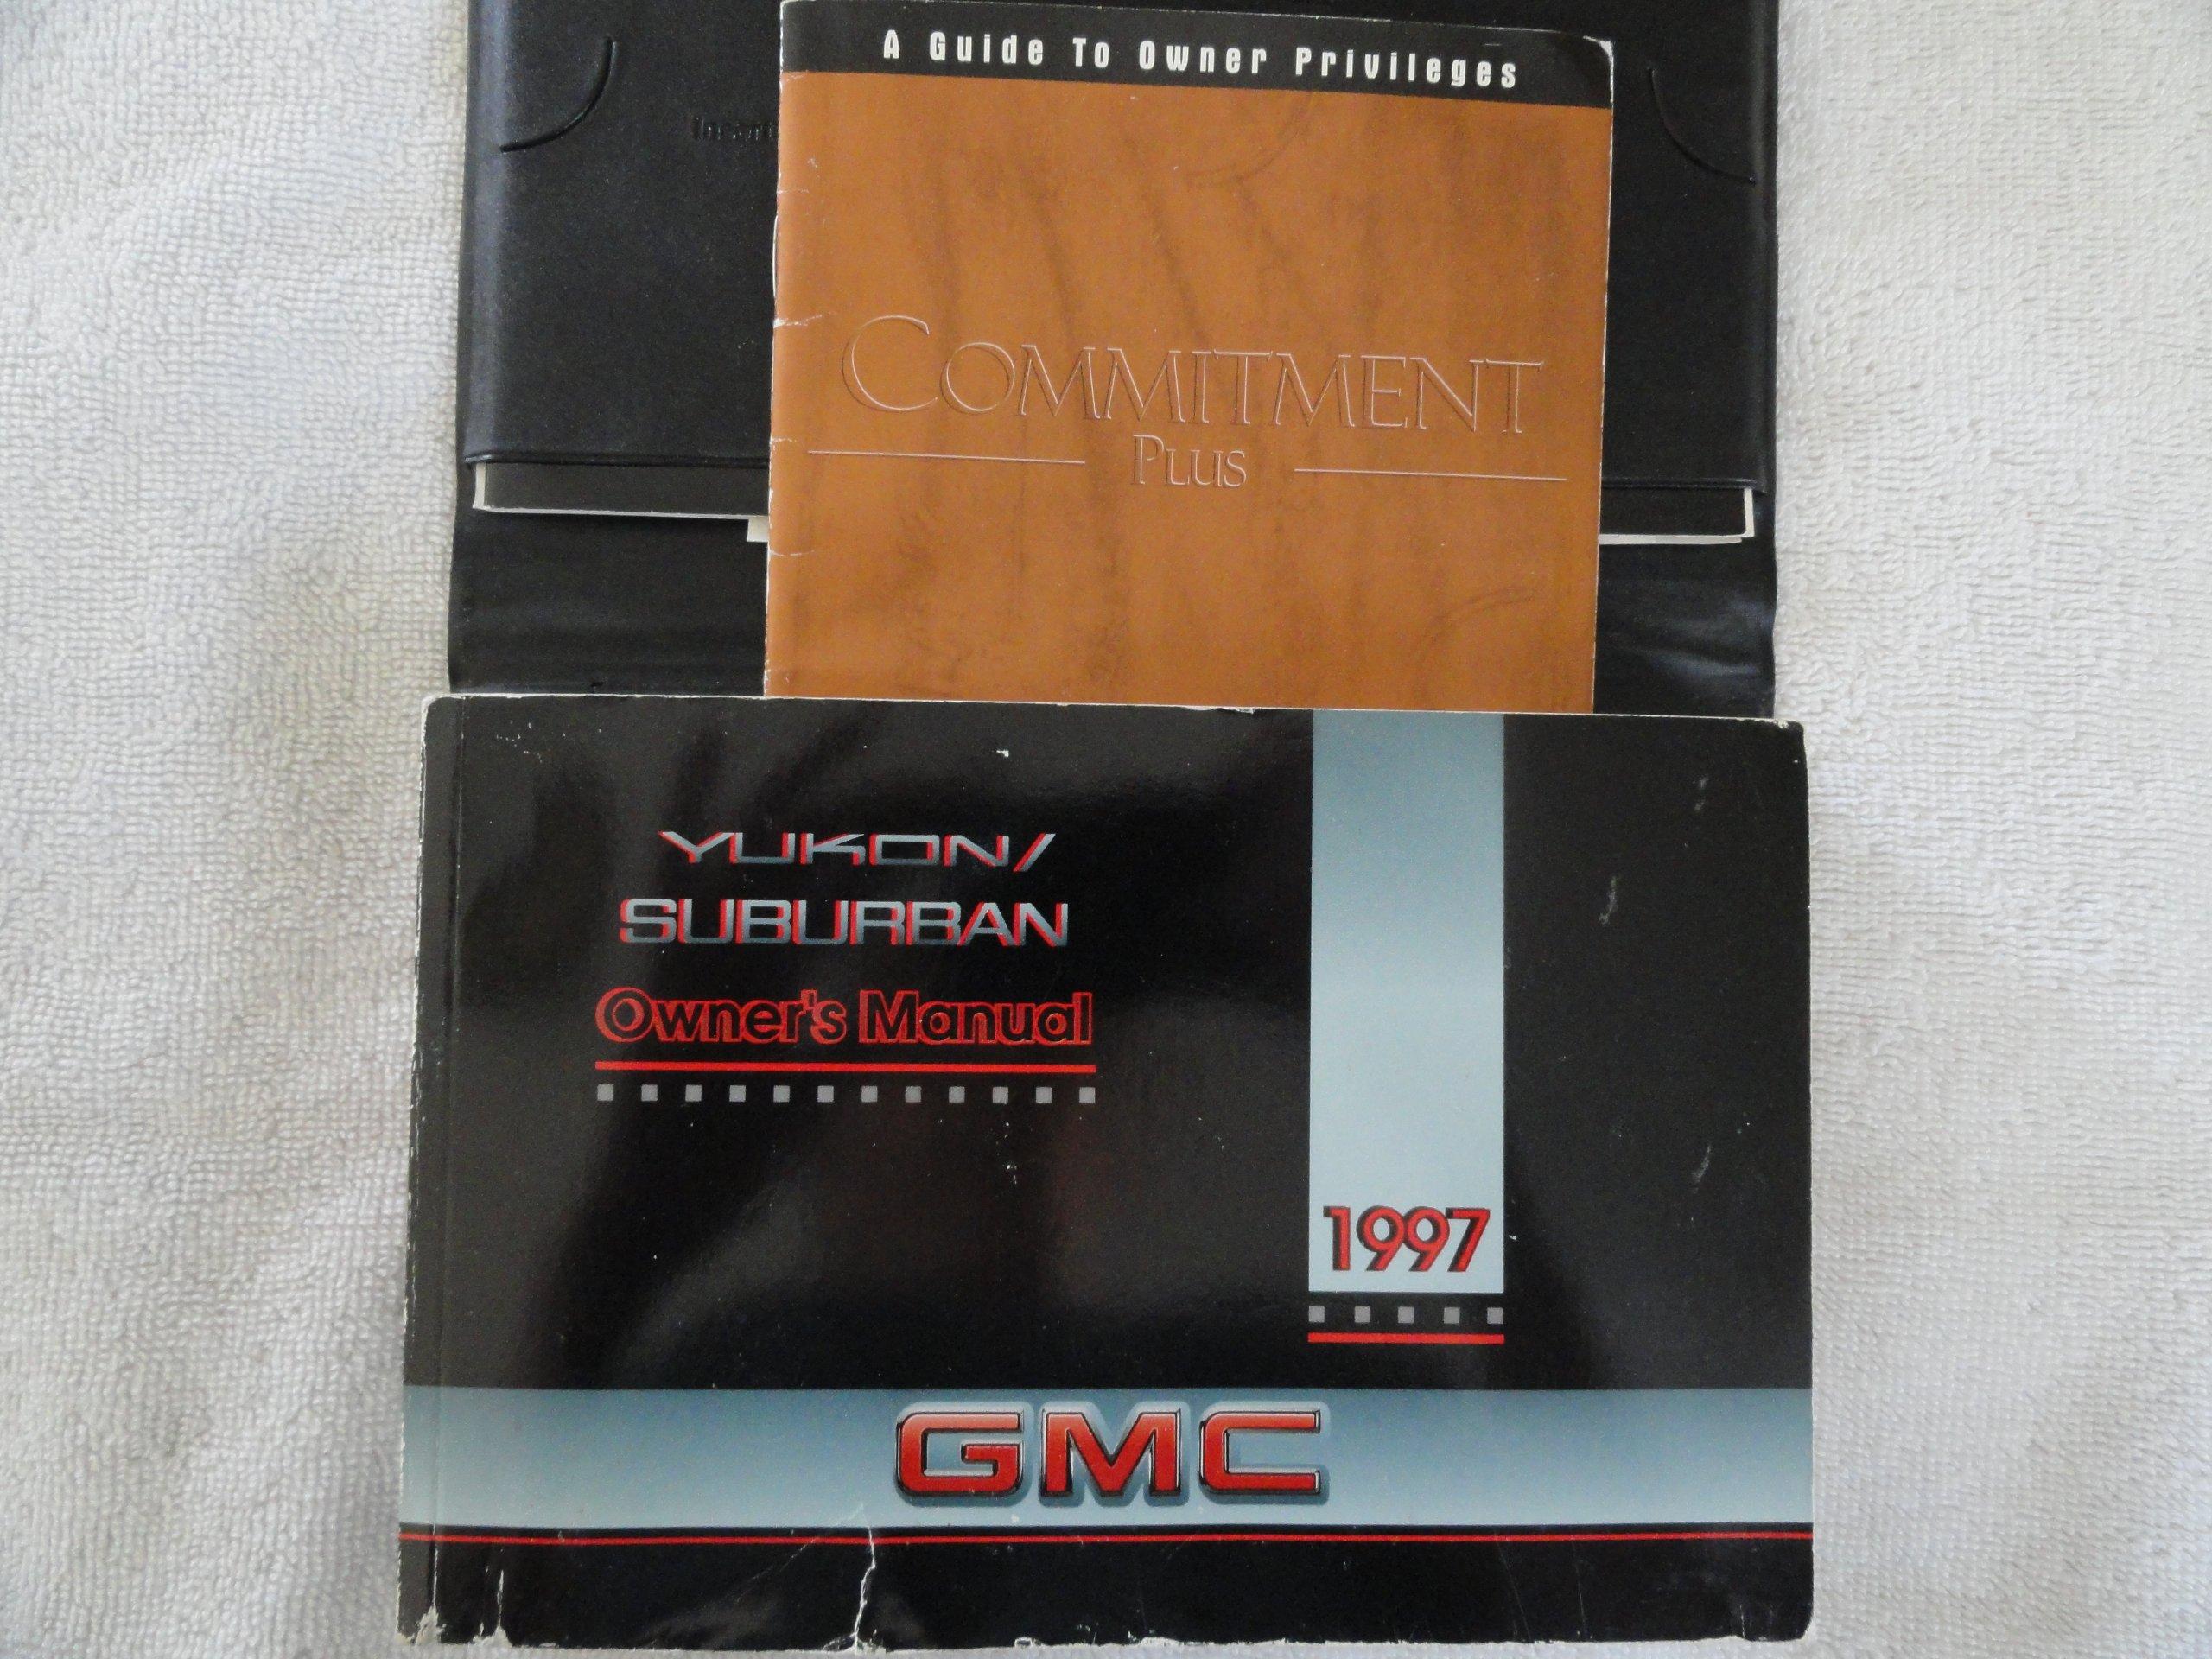 1997 gmc yukon chevy suburban owners manual general motors rh amazon com 1997 gmc suburban owners manual 2000 Suburban